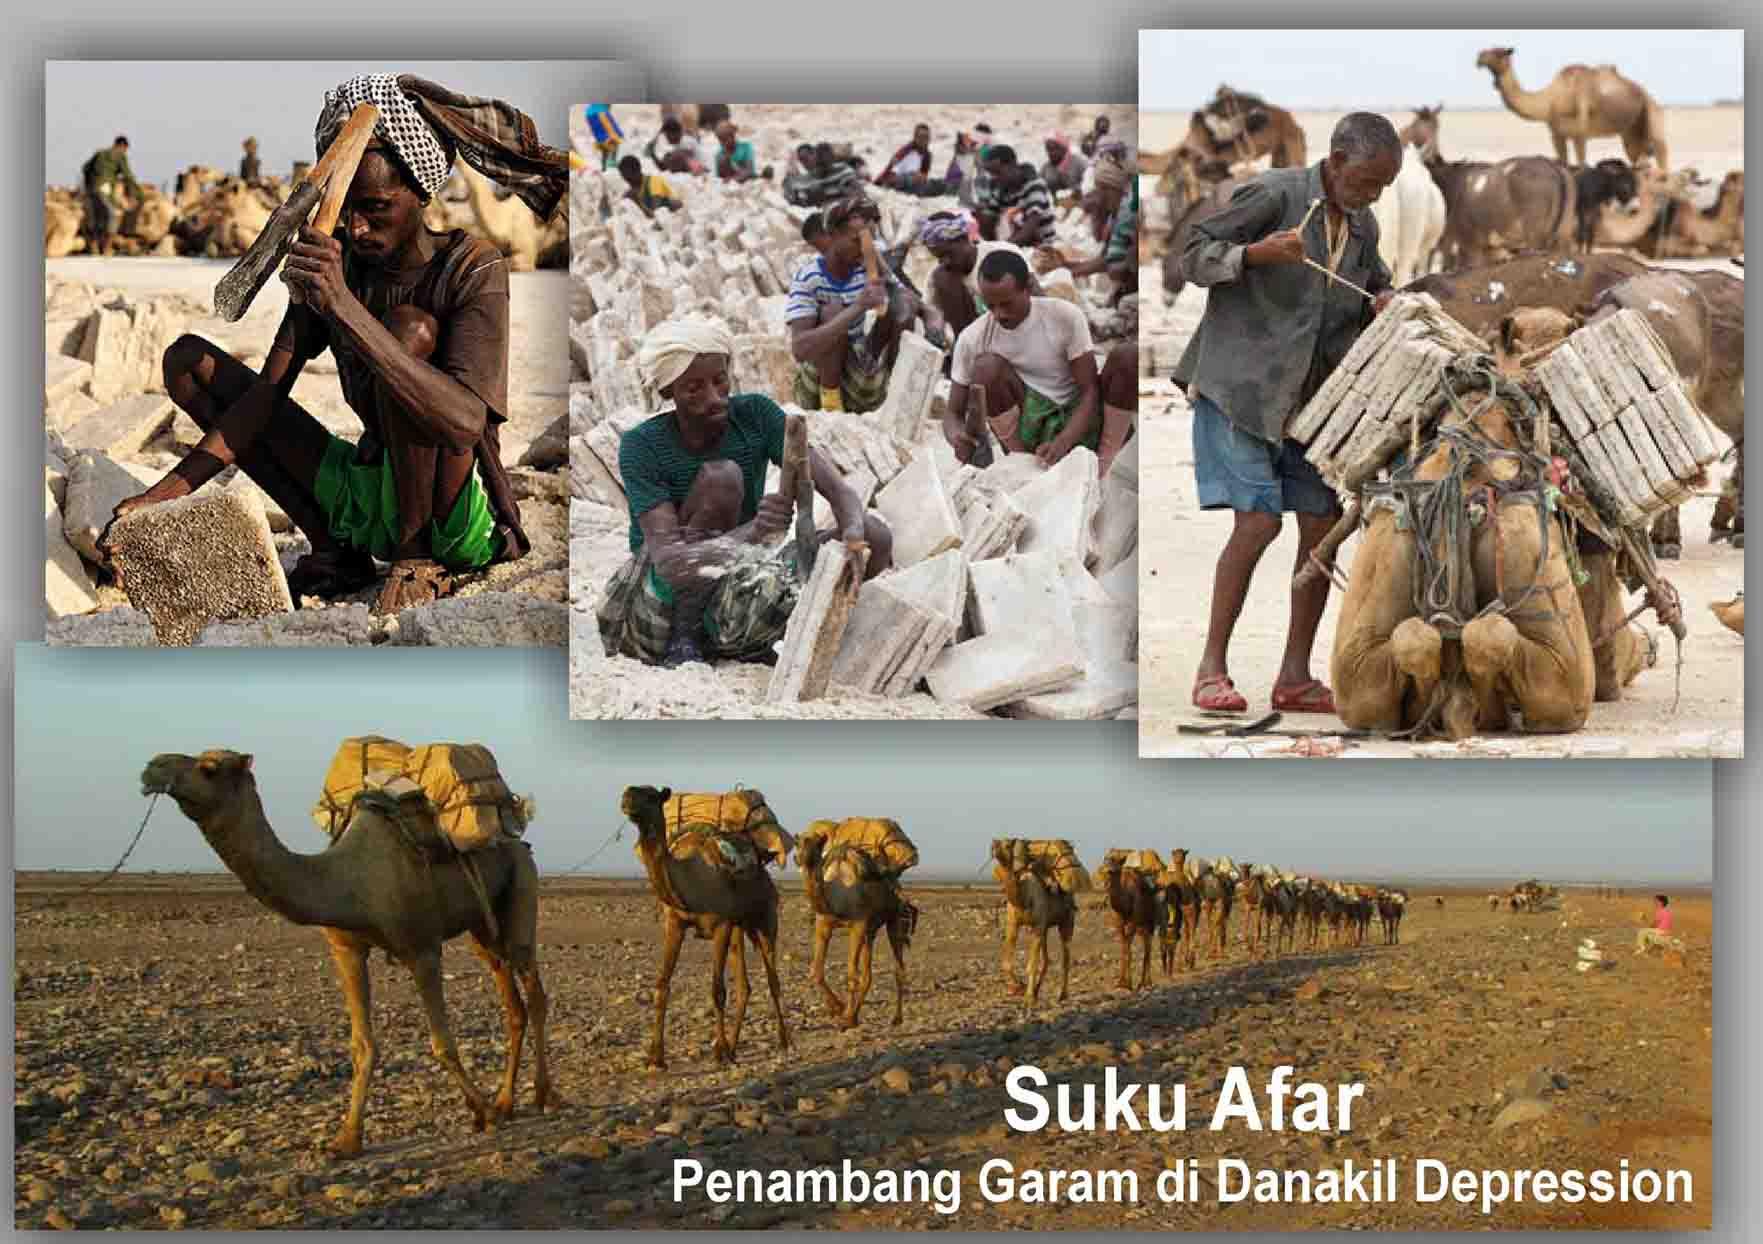 Suku Afar Danakil Depression, Olivier Grunewald, blue fire selain di Ijen, hoax blue fire Kawah Ijen